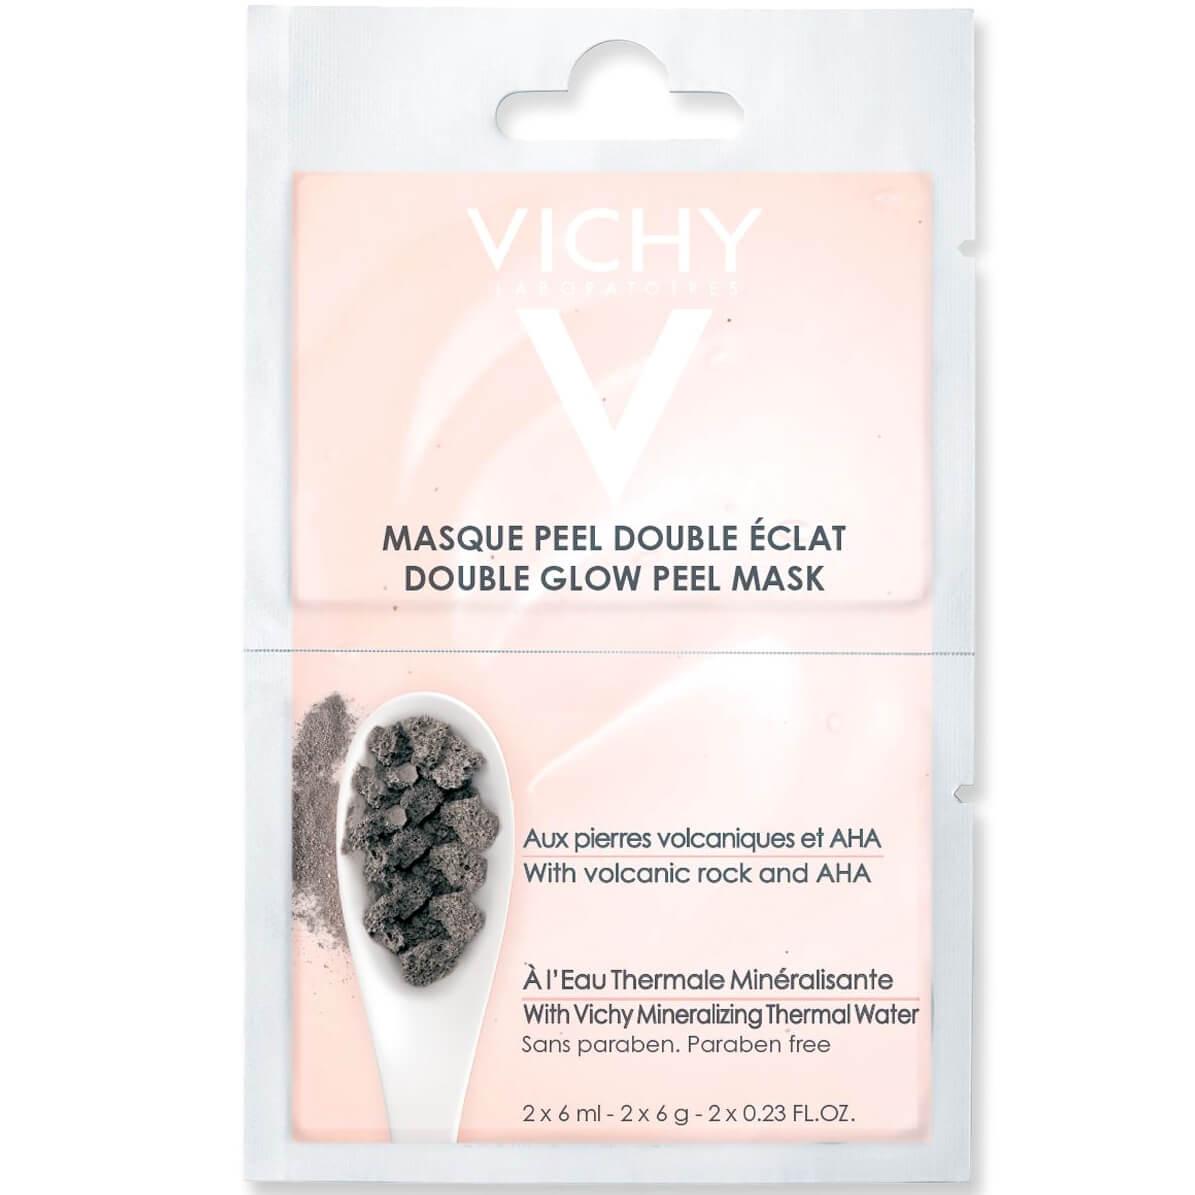 Vichy Masque Peel Double Eclat Μάσκα Διπλής Λάμψης και Απολέπισης 2x6ml